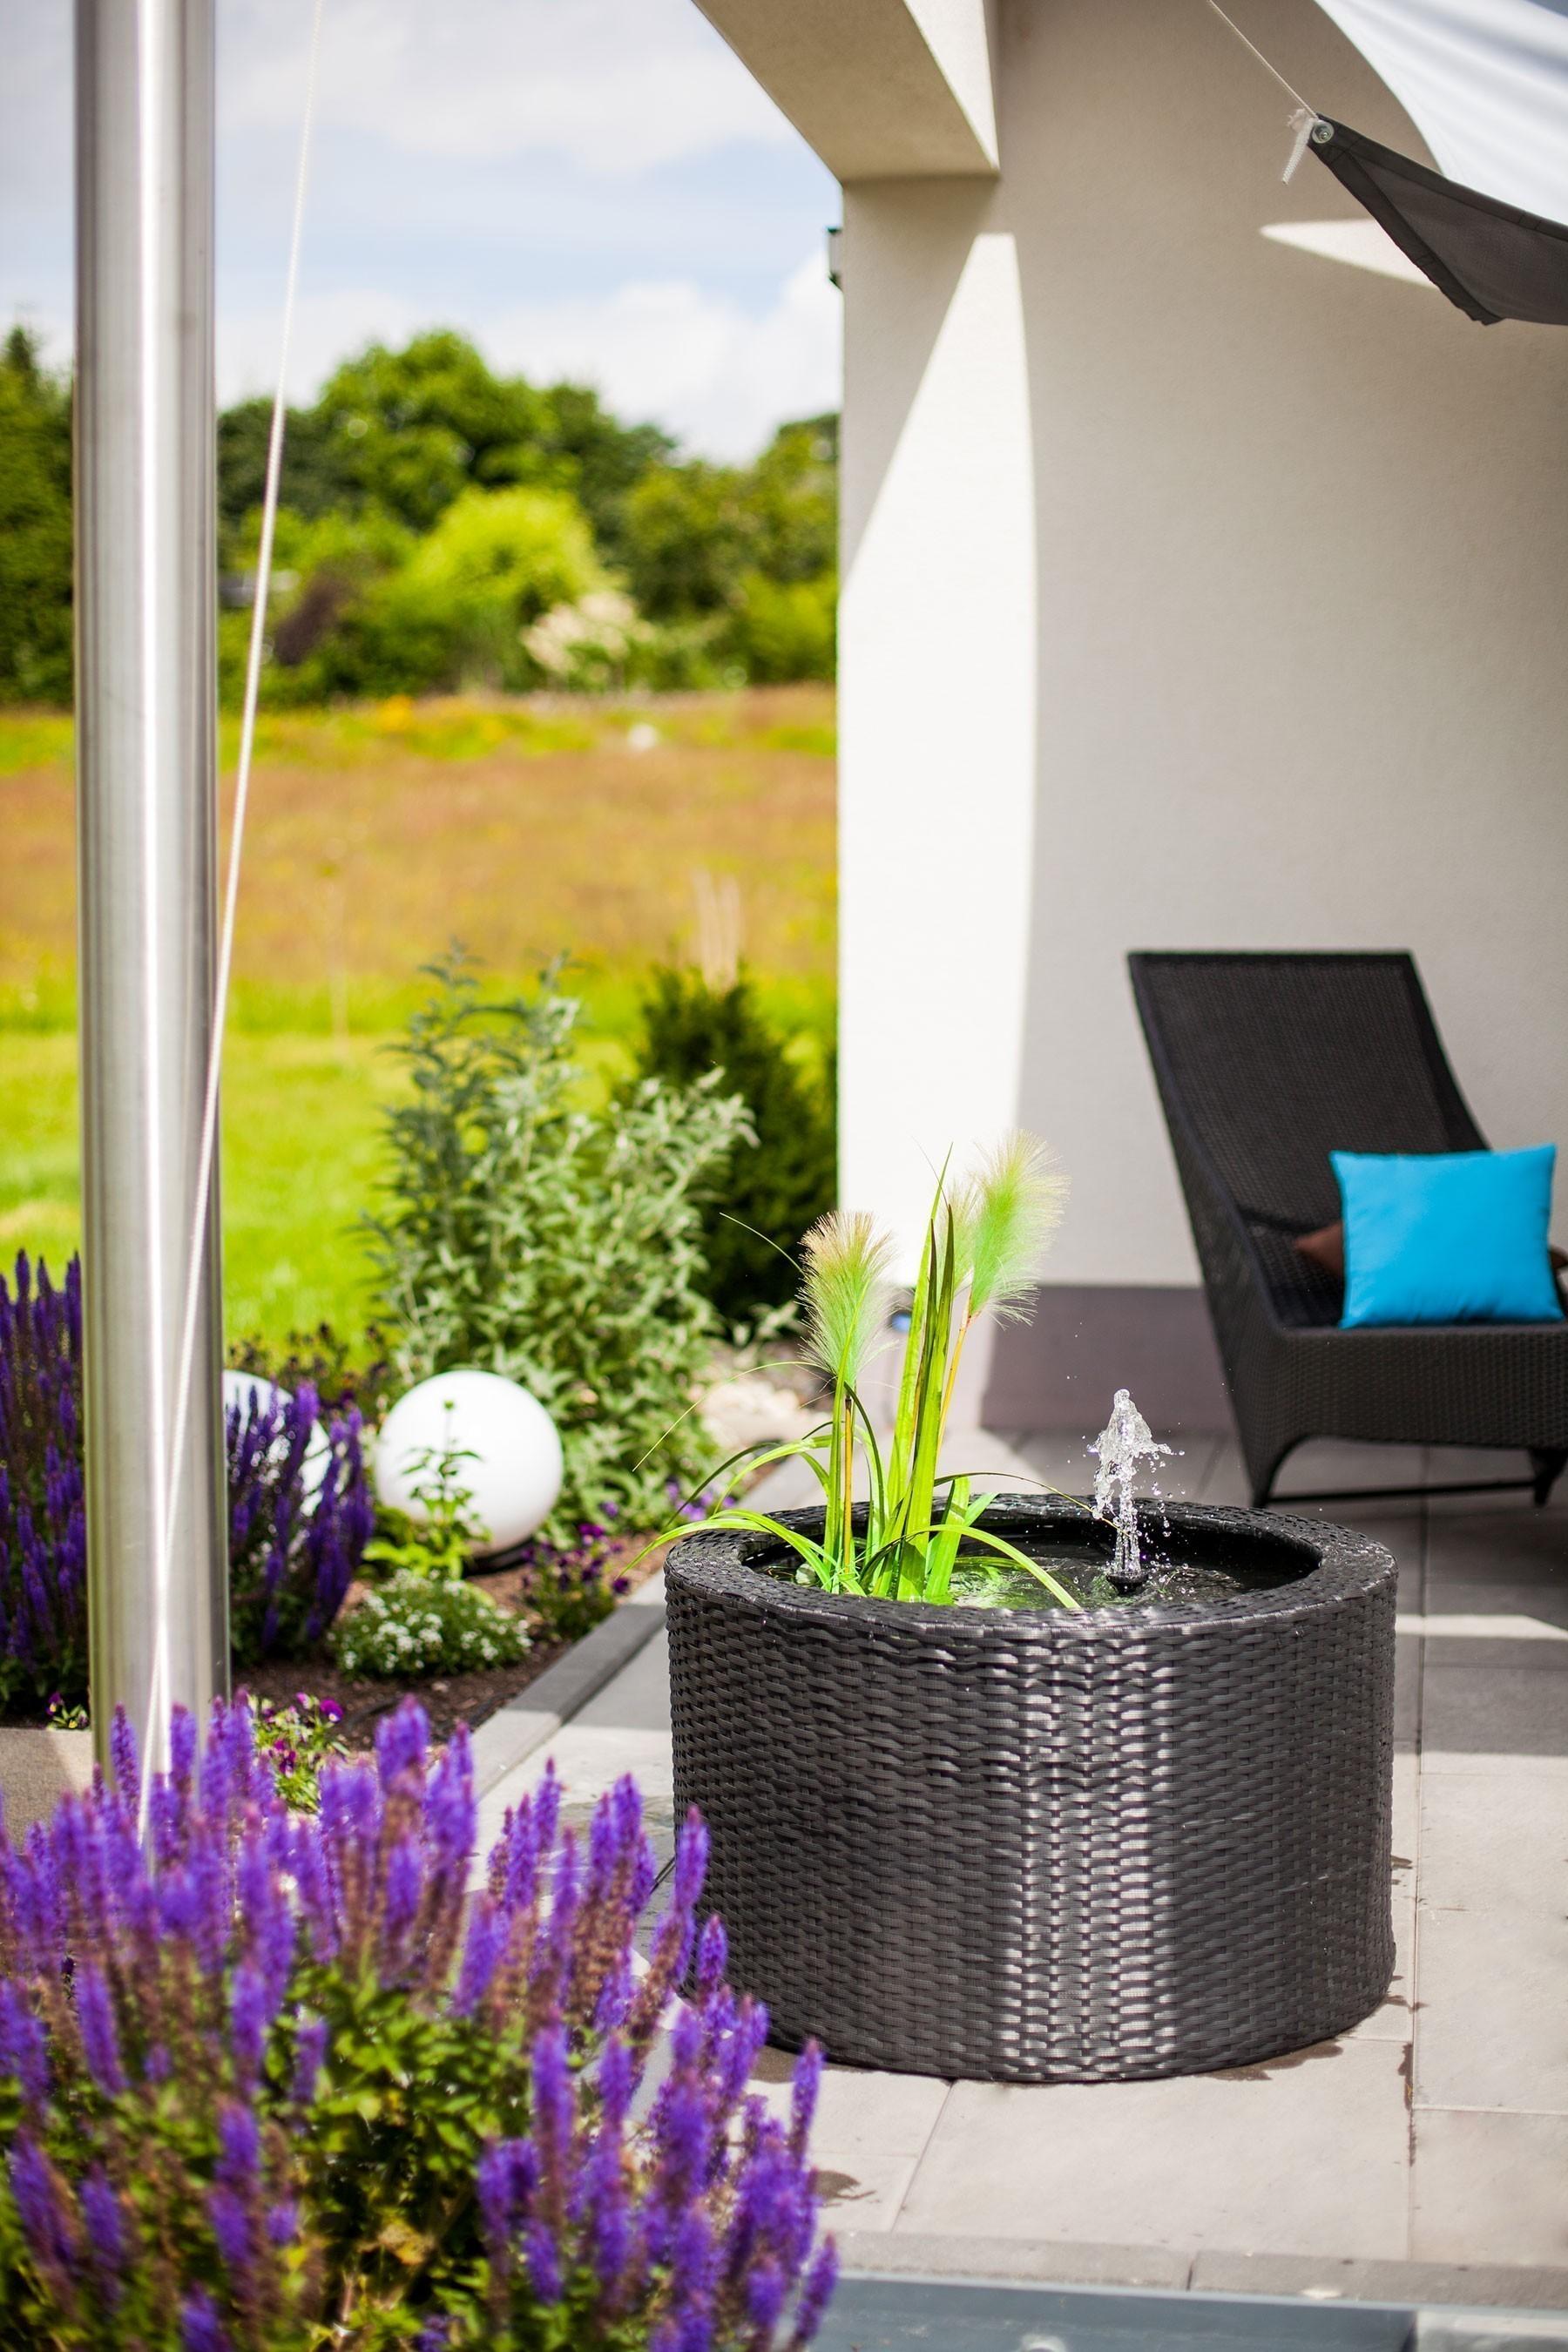 heissner wassergarten set terrassenbrunnen rattan patio. Black Bedroom Furniture Sets. Home Design Ideas